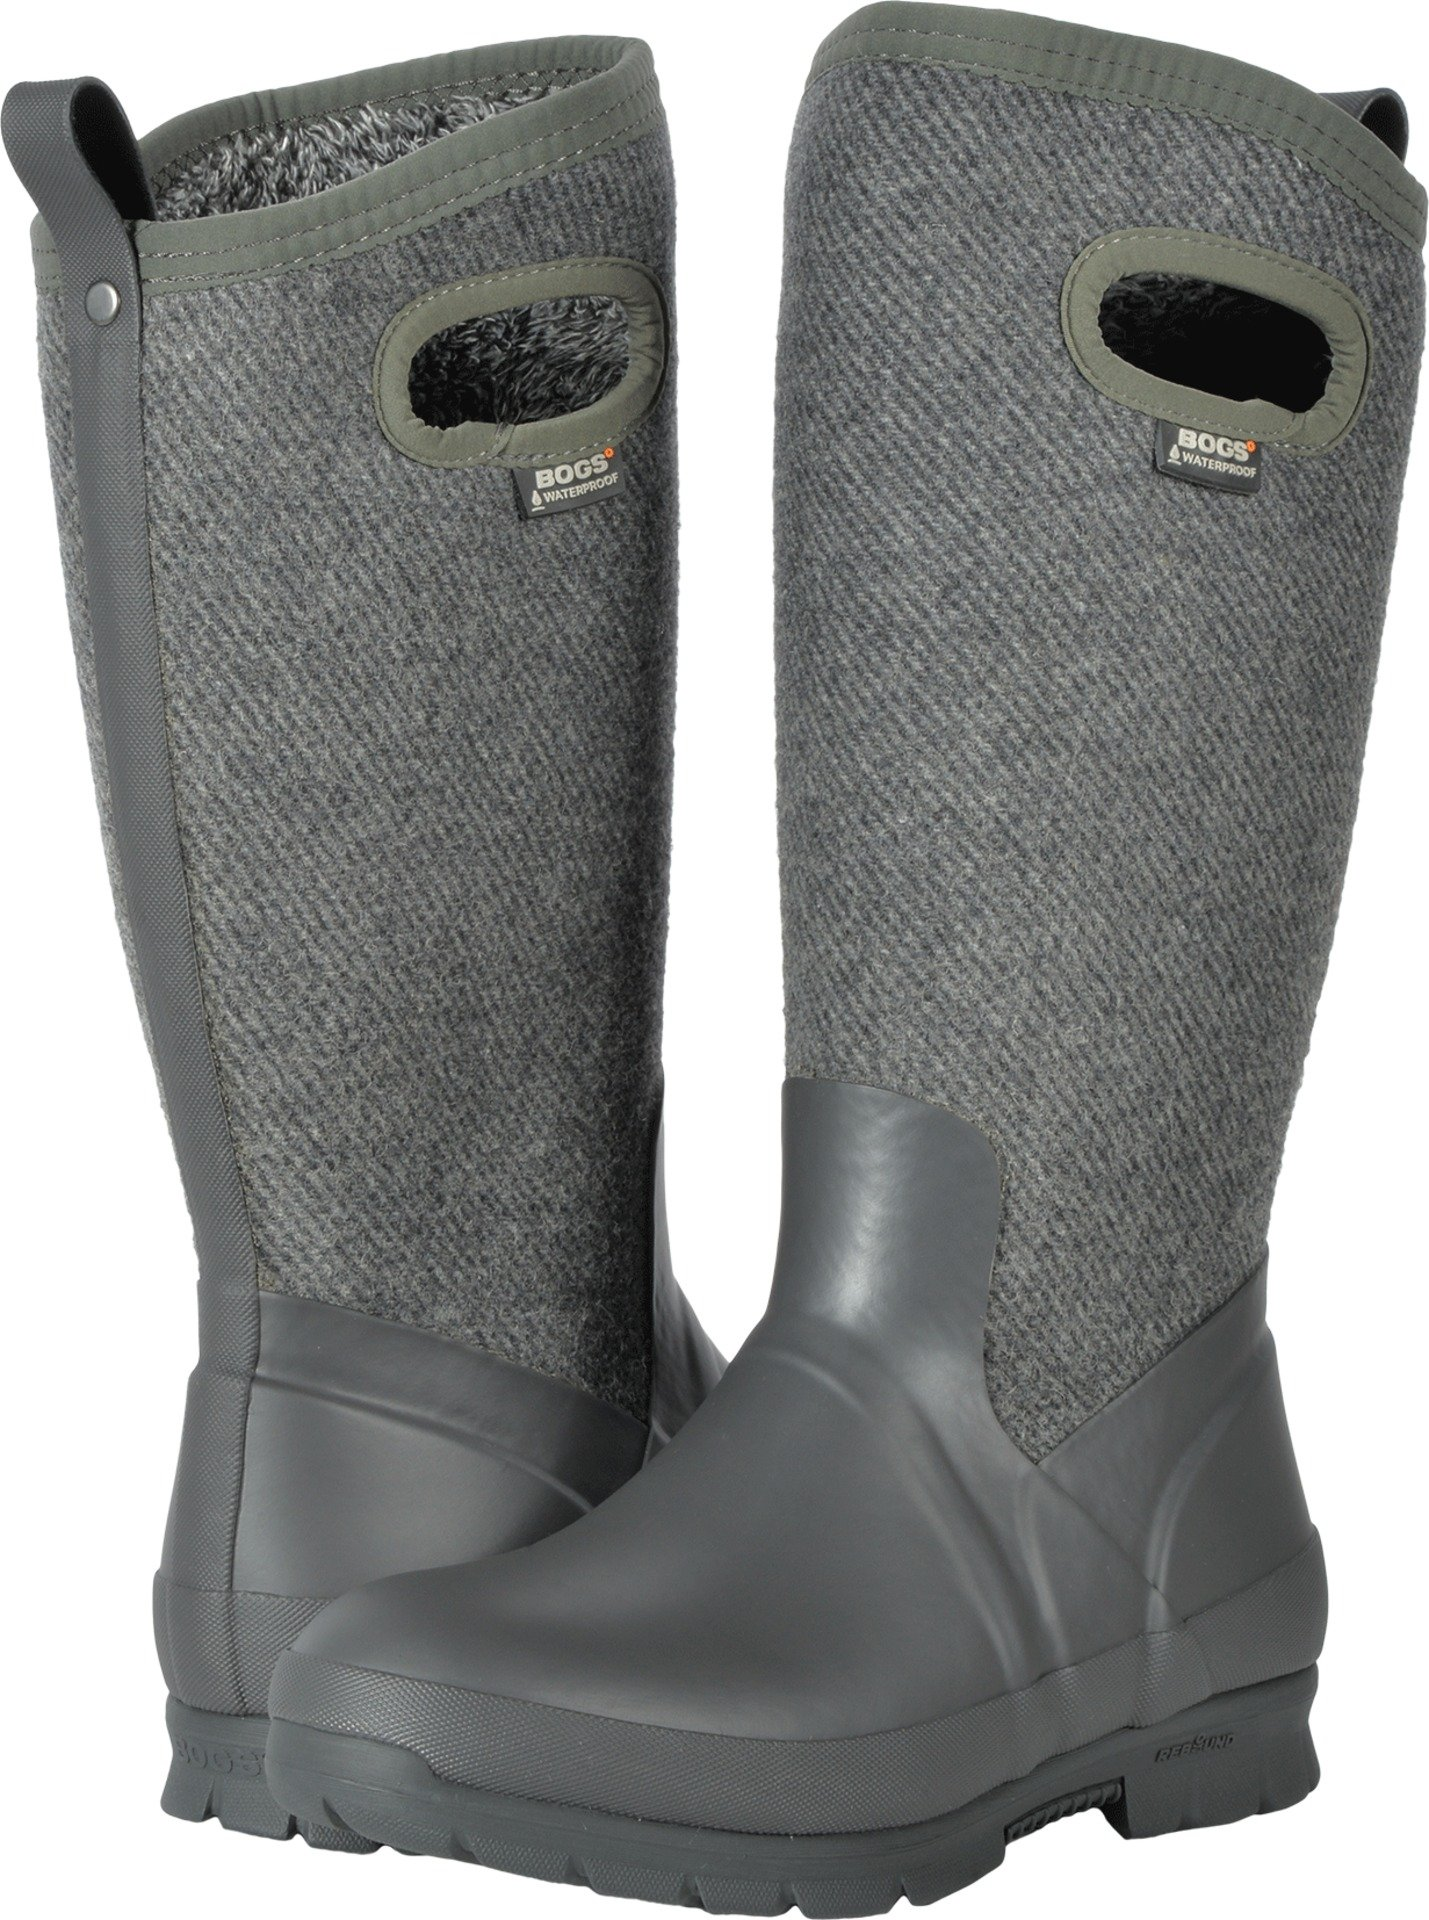 Bogs Outdoor Boot Women Crandall Wool Pull On 7 M Dark Gray Gold 72108